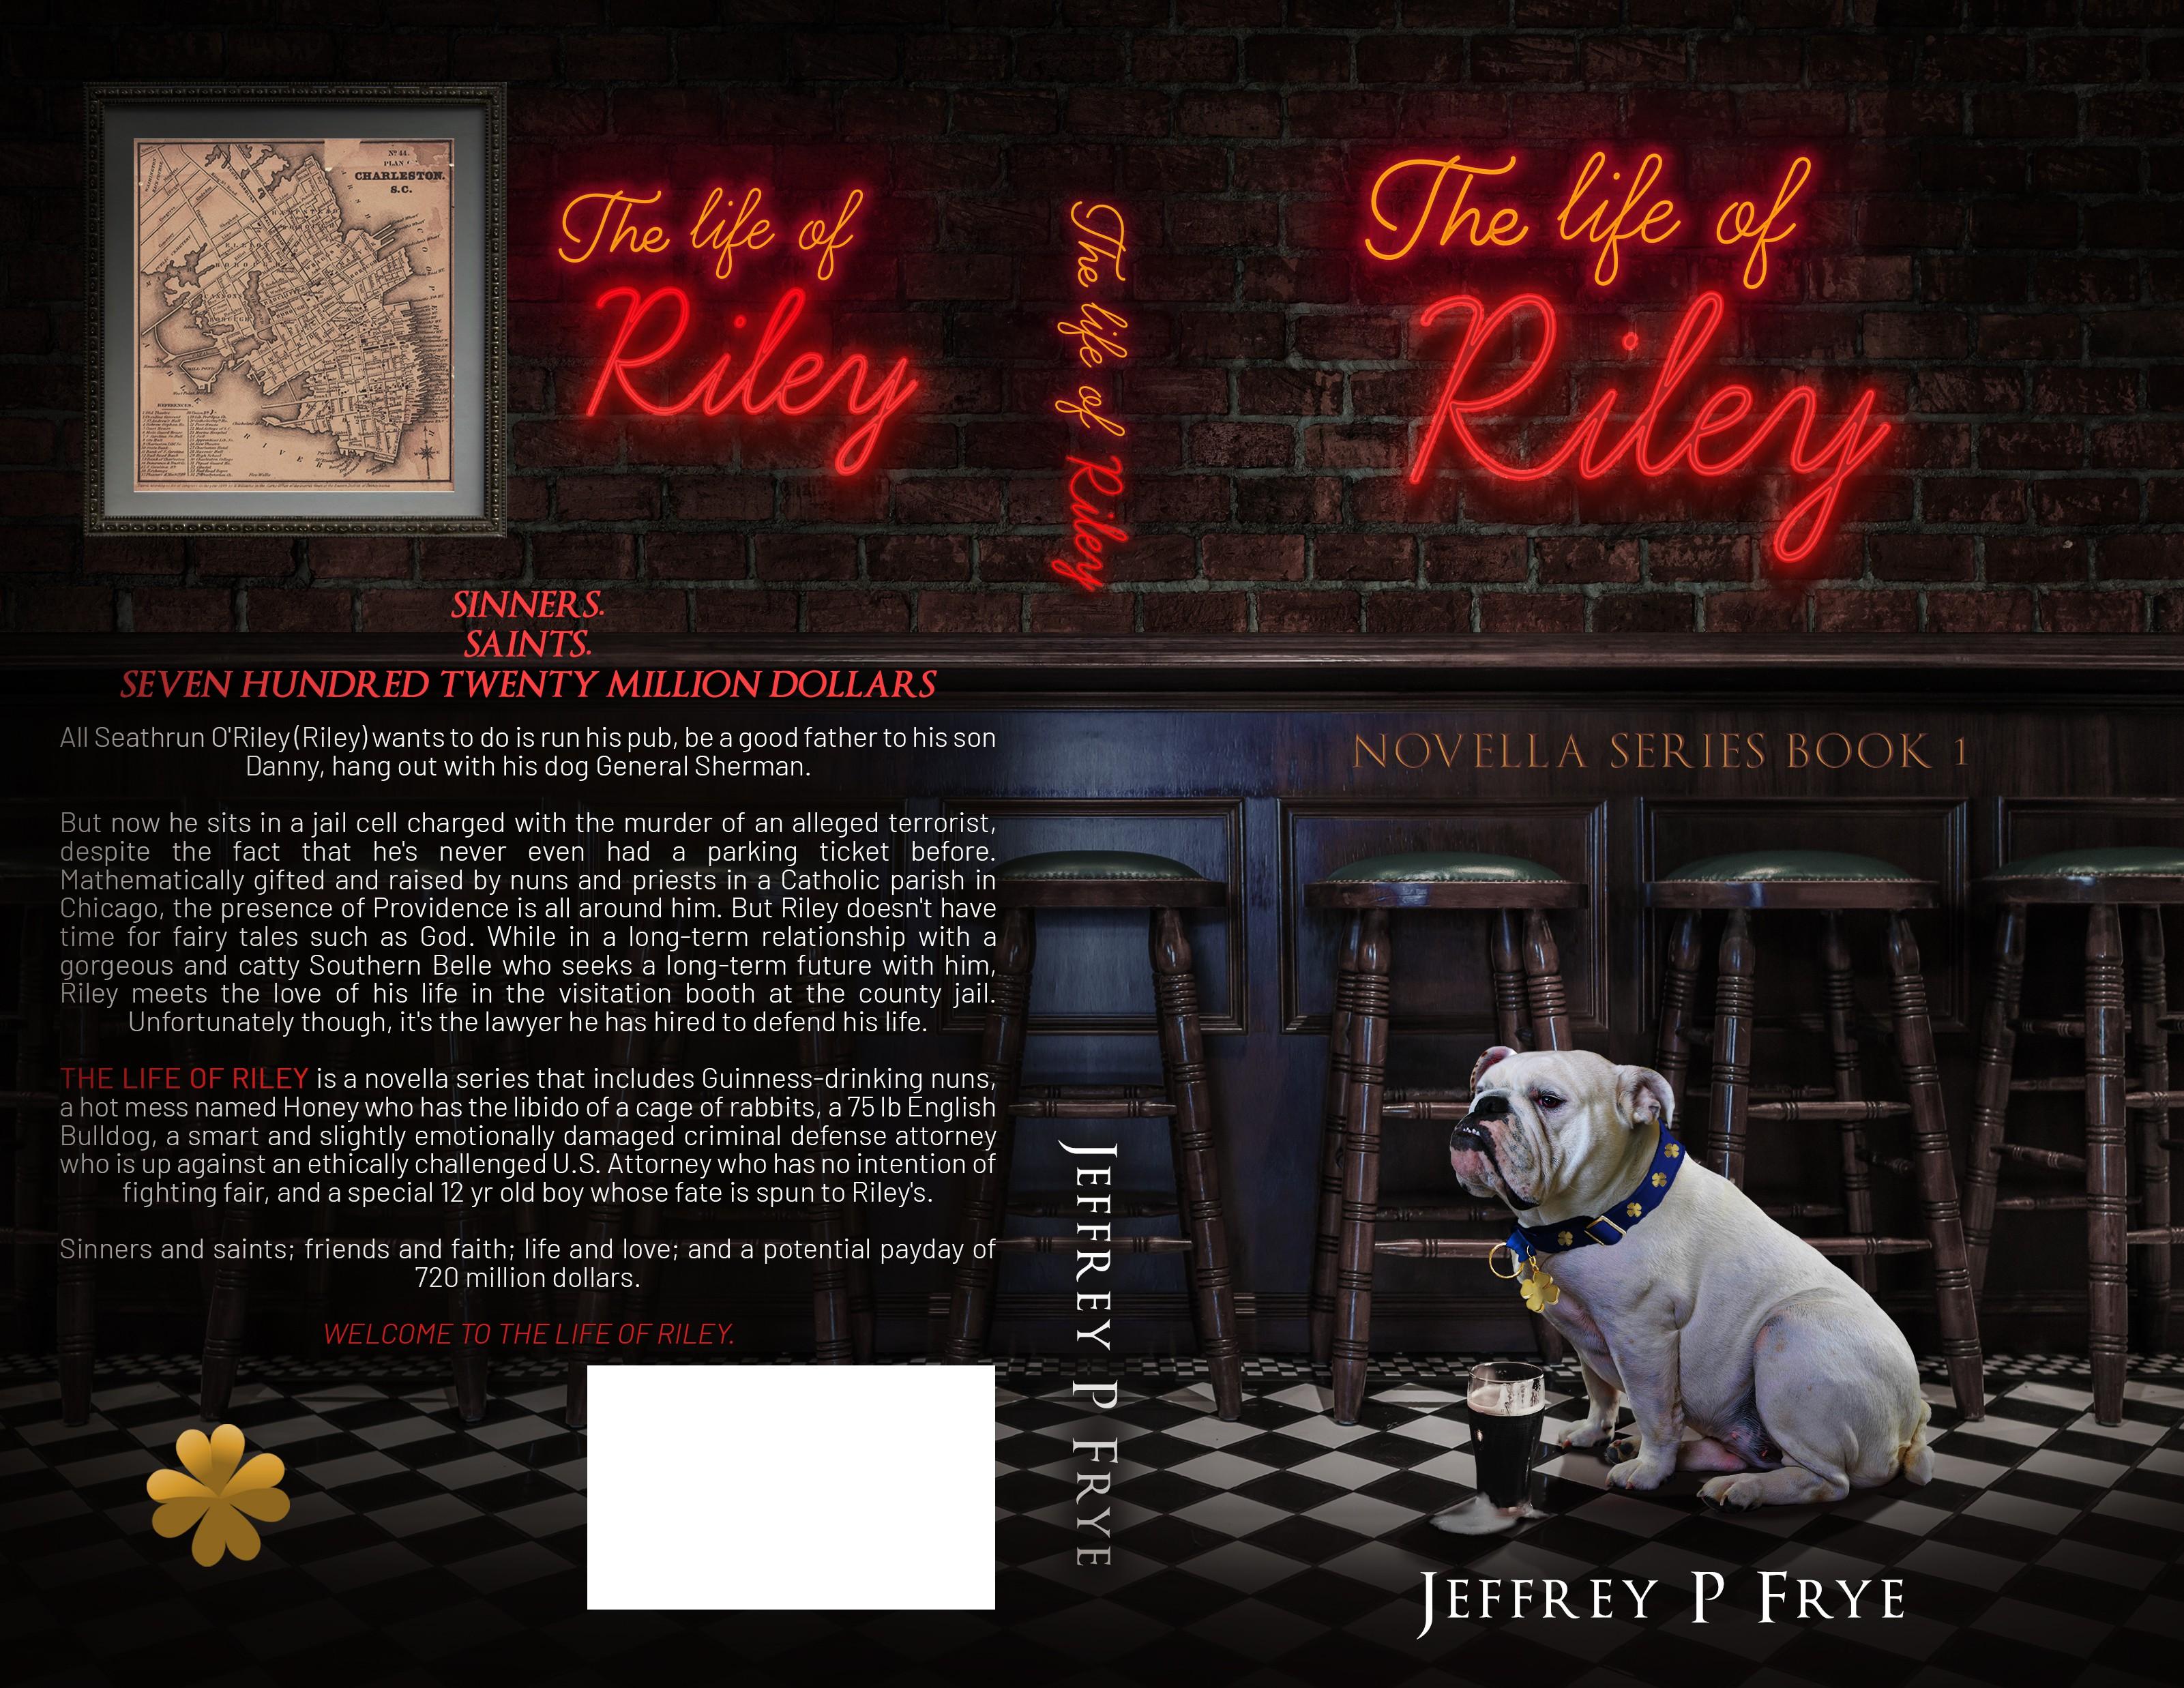 Bank robber turned novelist needs a stunning cover